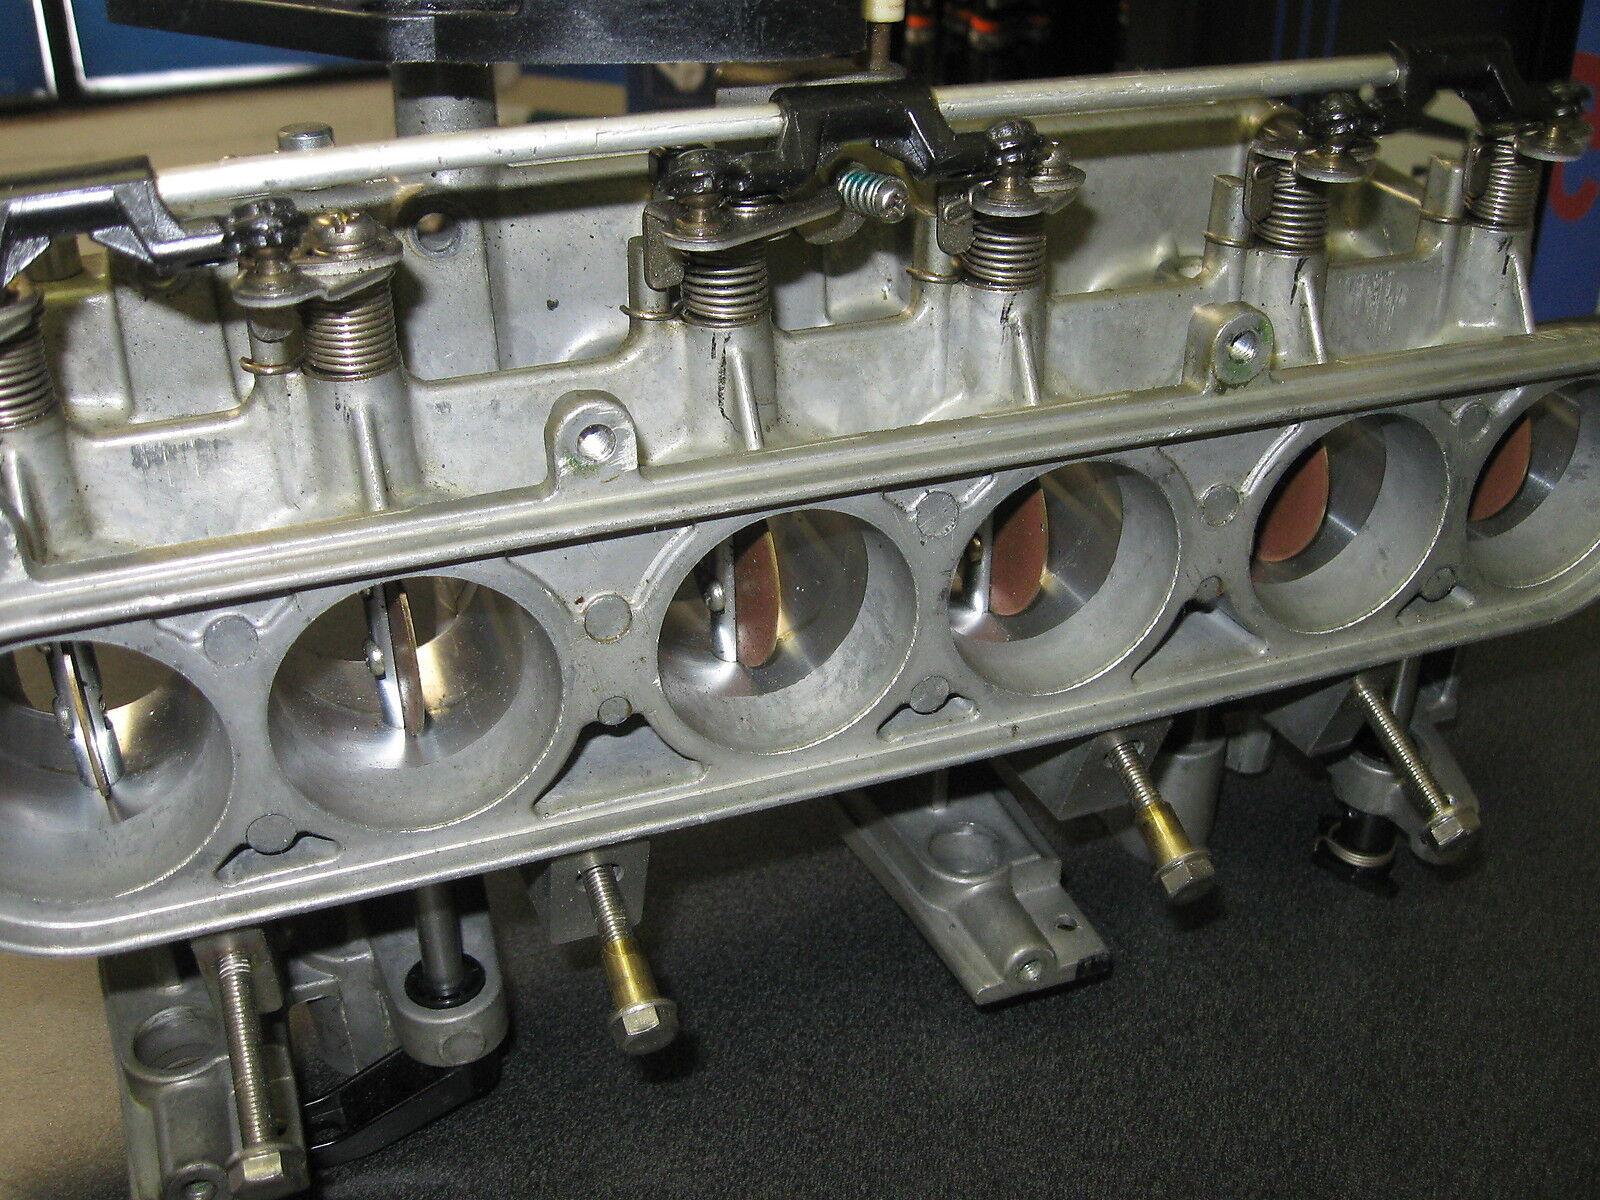 Yamaha Teilenummer Außenborder Drosselklappengehäuse 1 Teilenummer Yamaha 67H-13751-00-00 20fa20